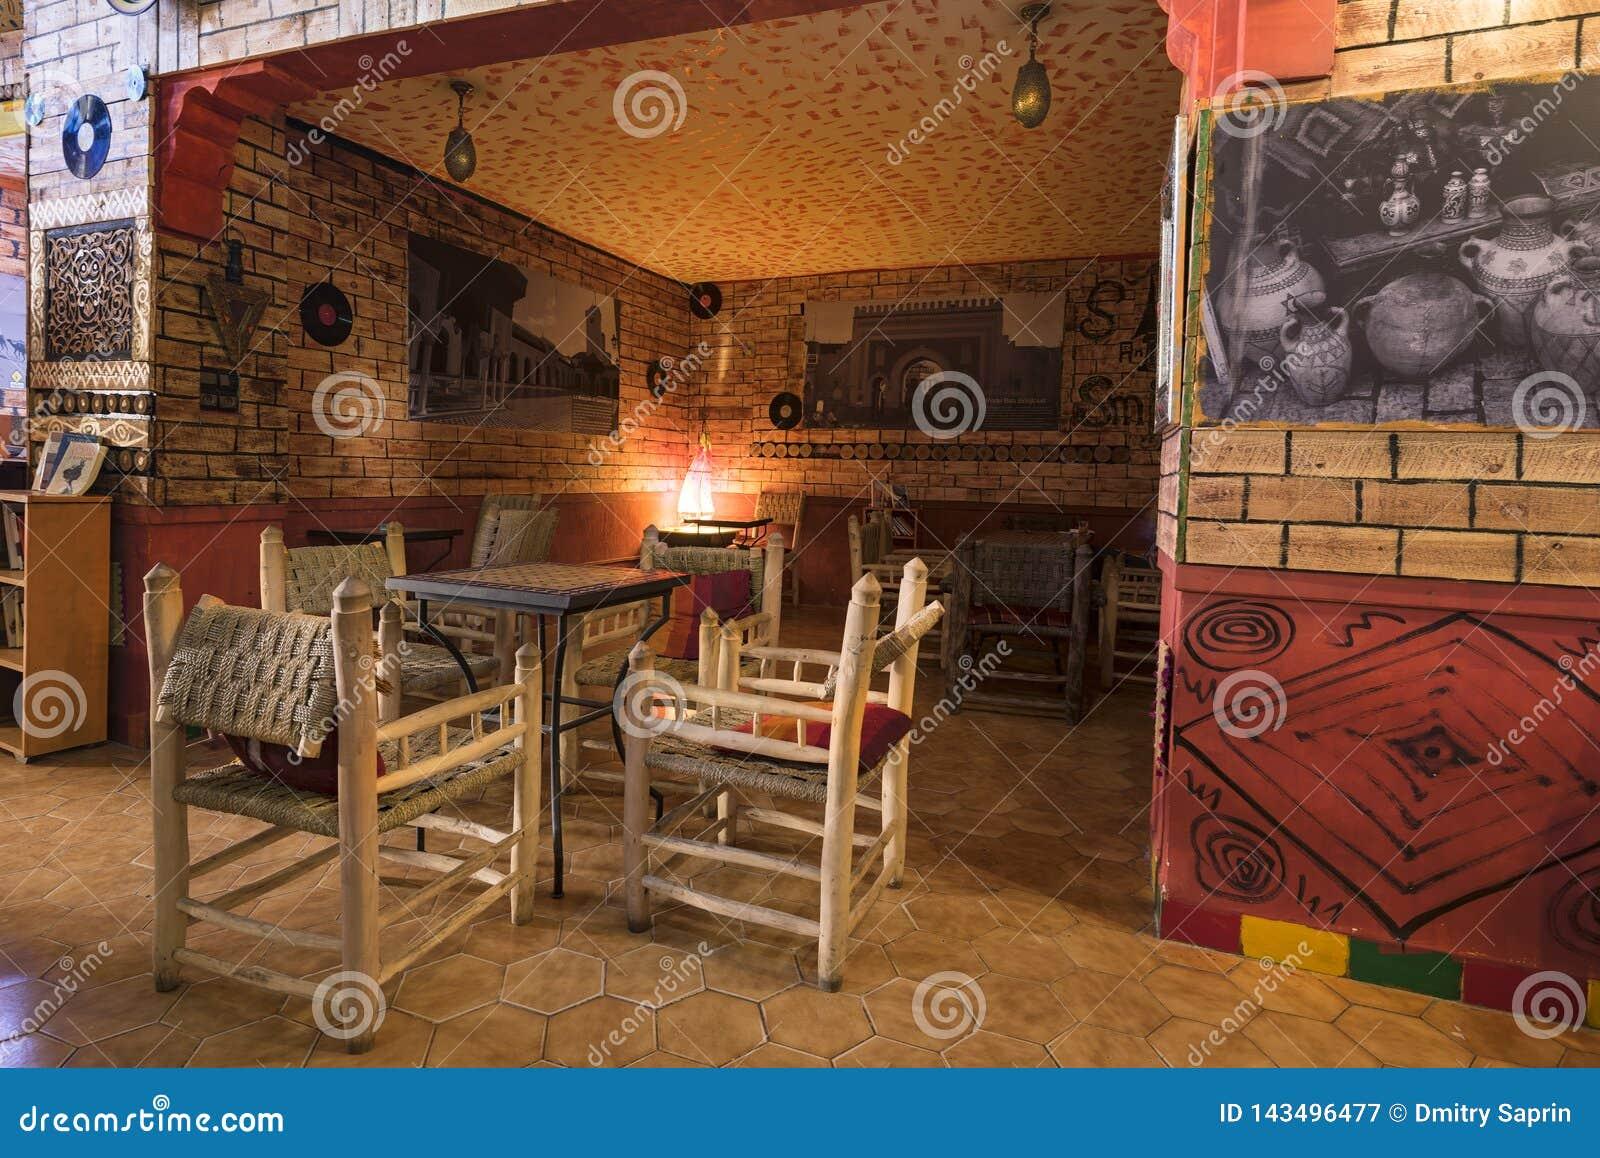 Moroccan Restaurant Interior Editorial Photography Image Of Marokko Modern 143496477